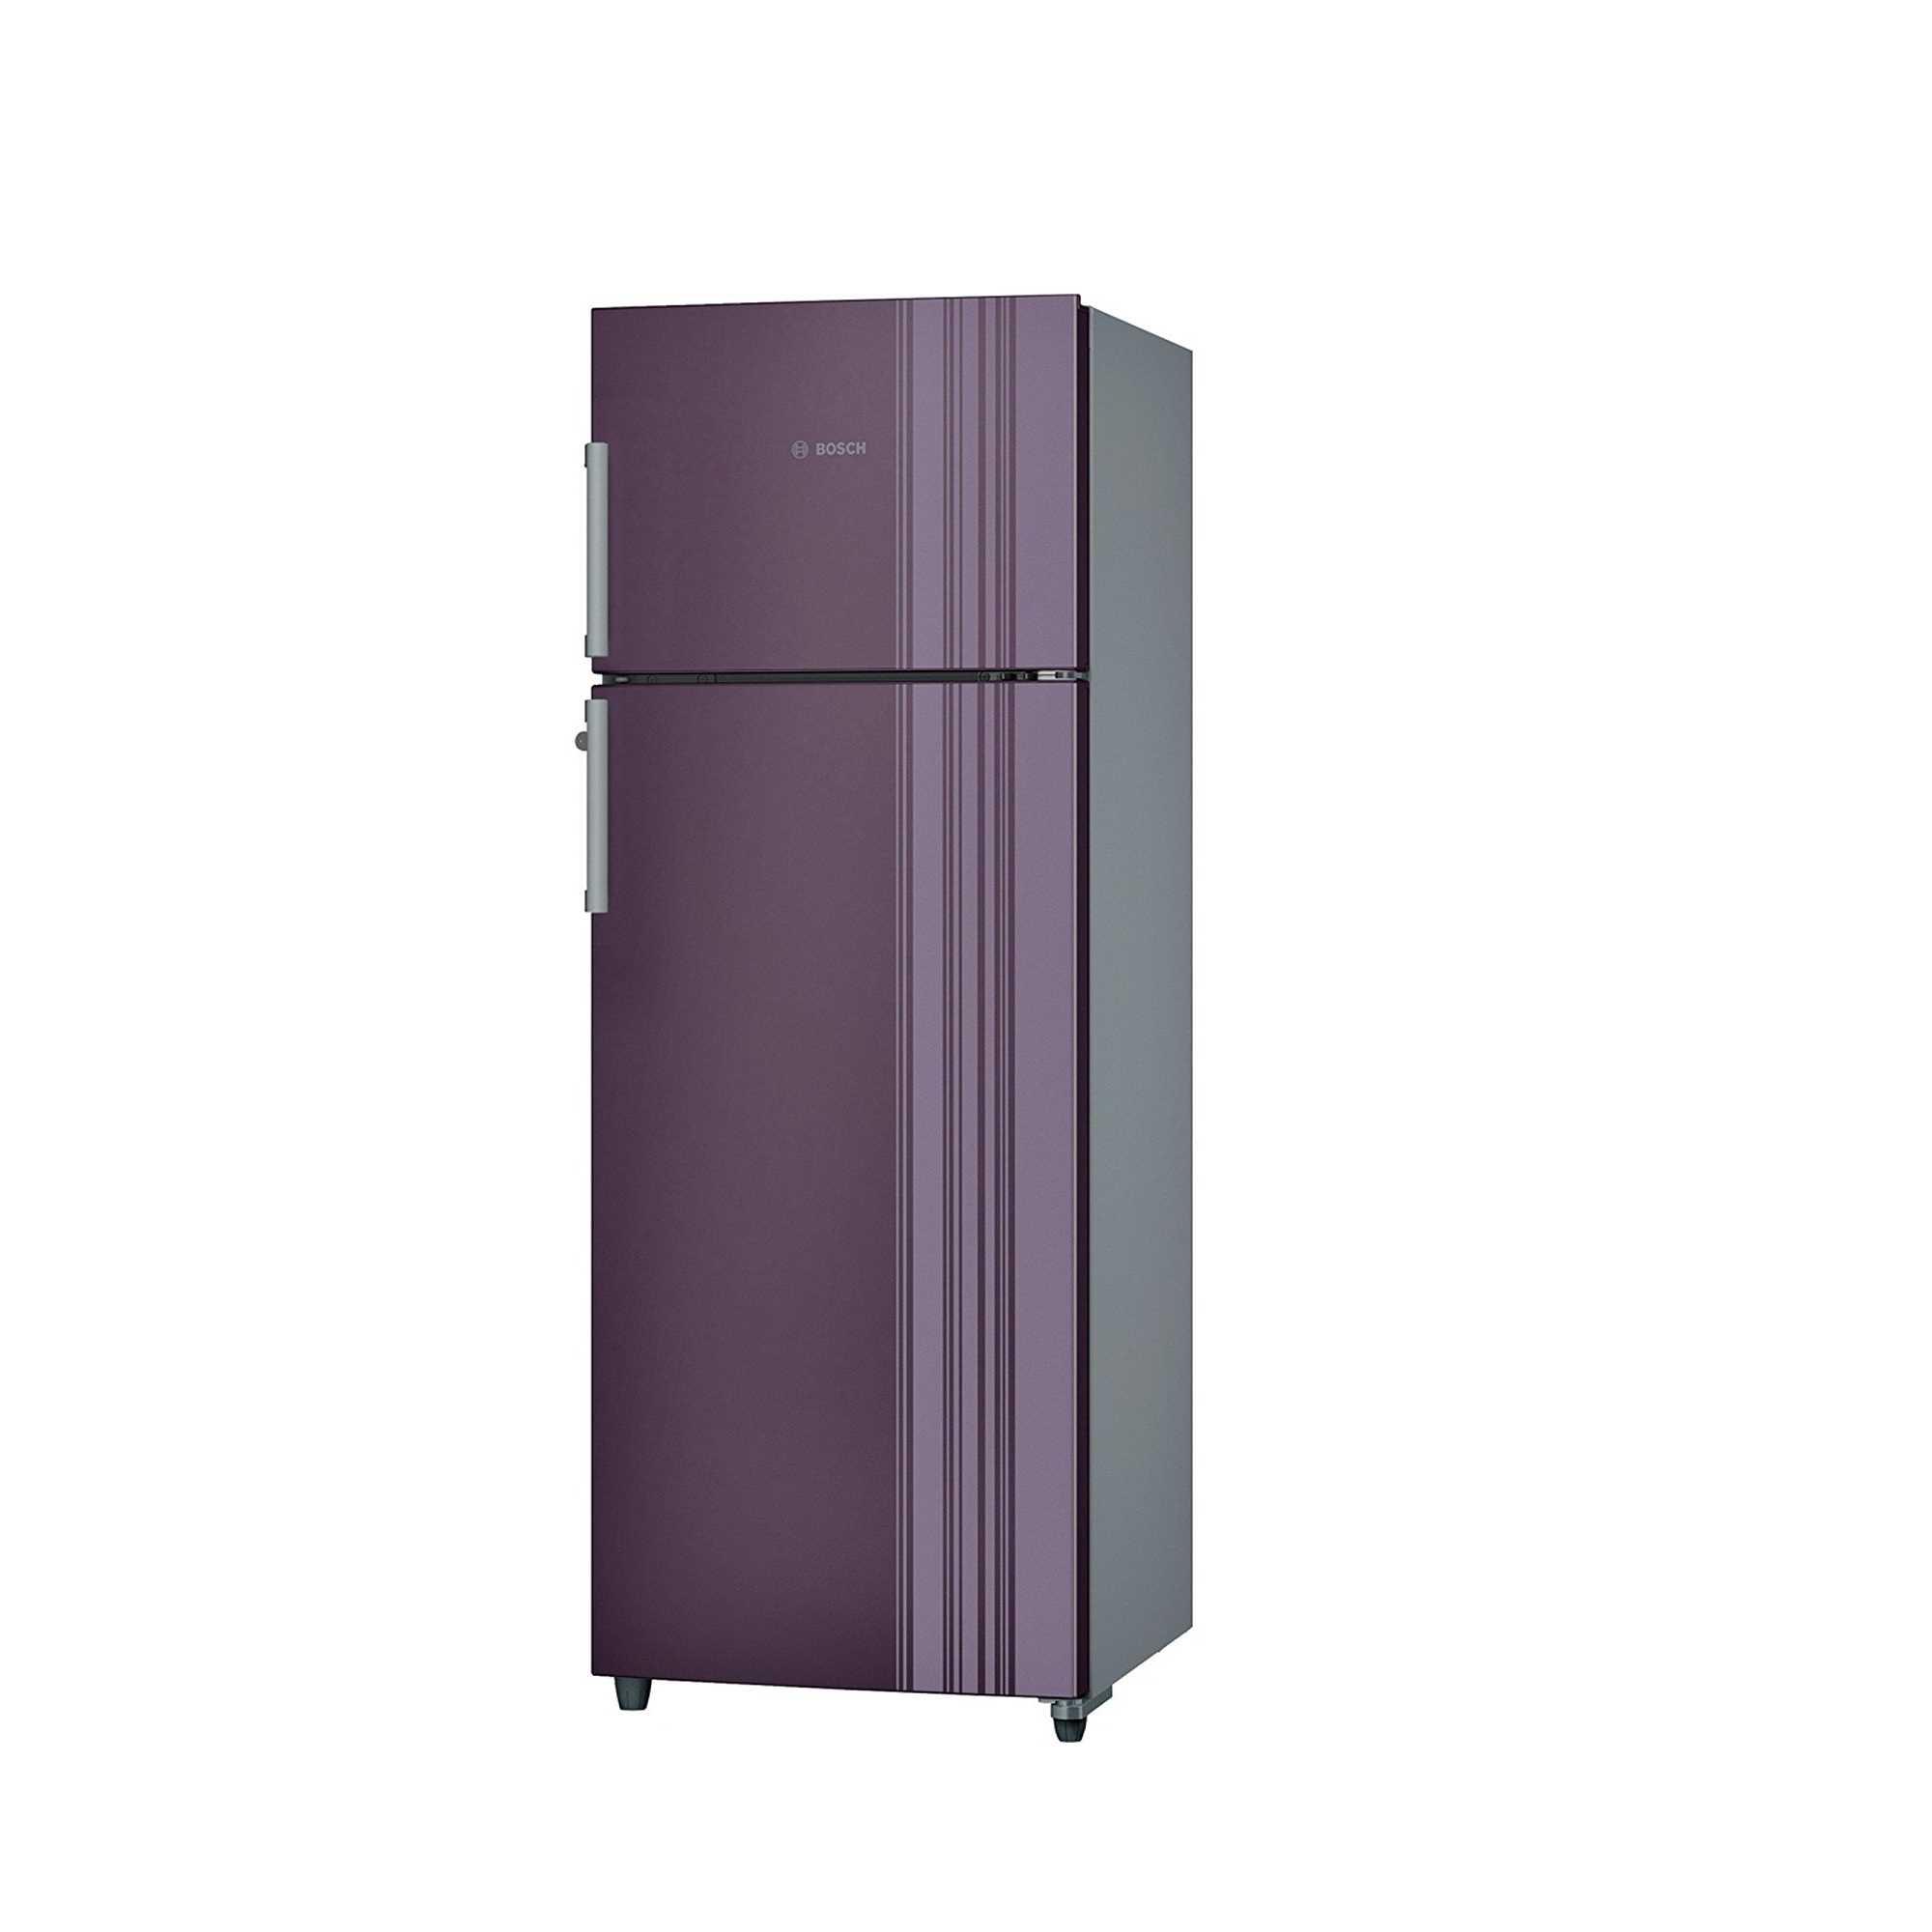 Bosch KDN30VR30I Double Door 290 Litre Frost Free Refrigerator